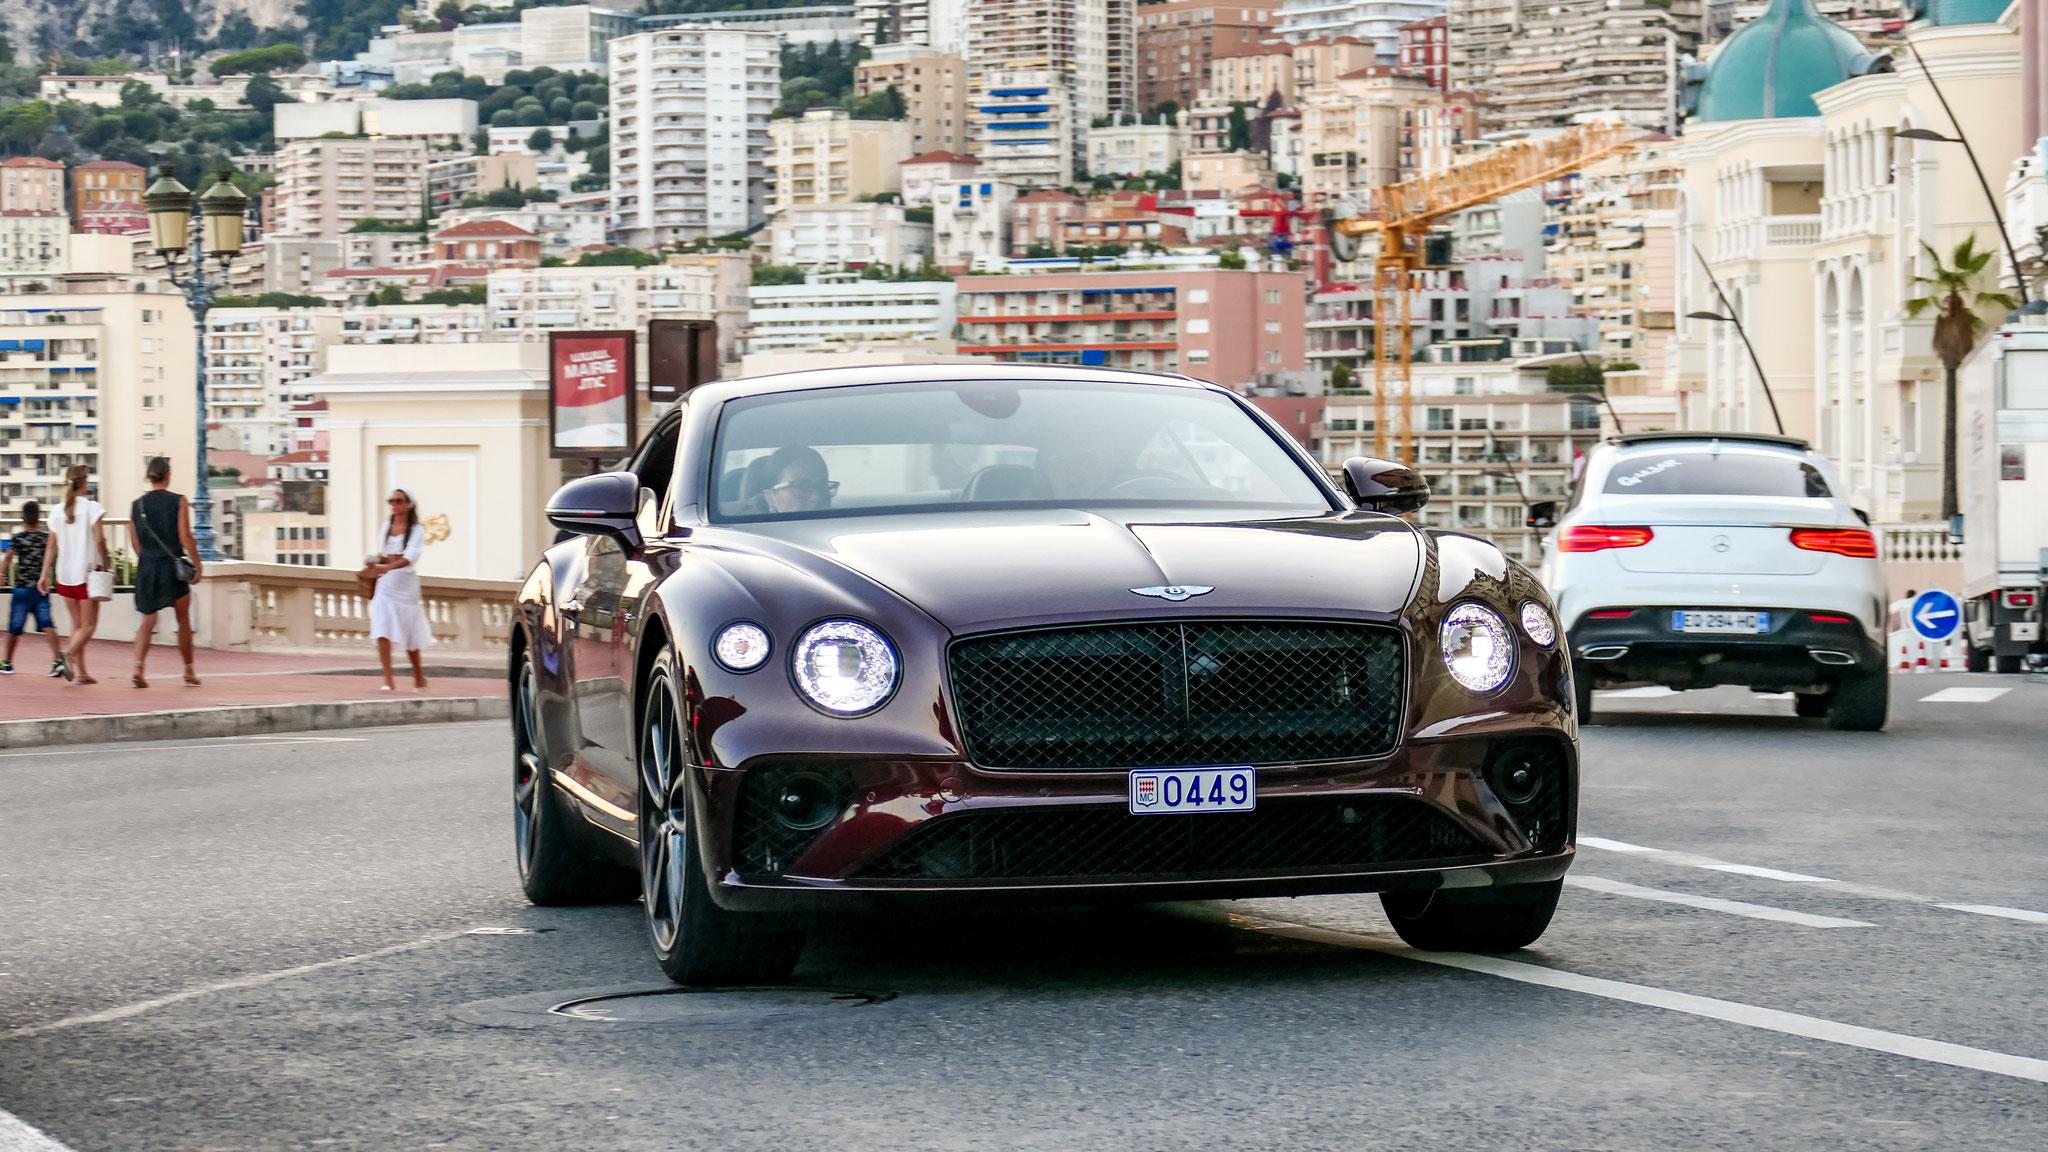 Bentley Continental GT - 0449 (MC)